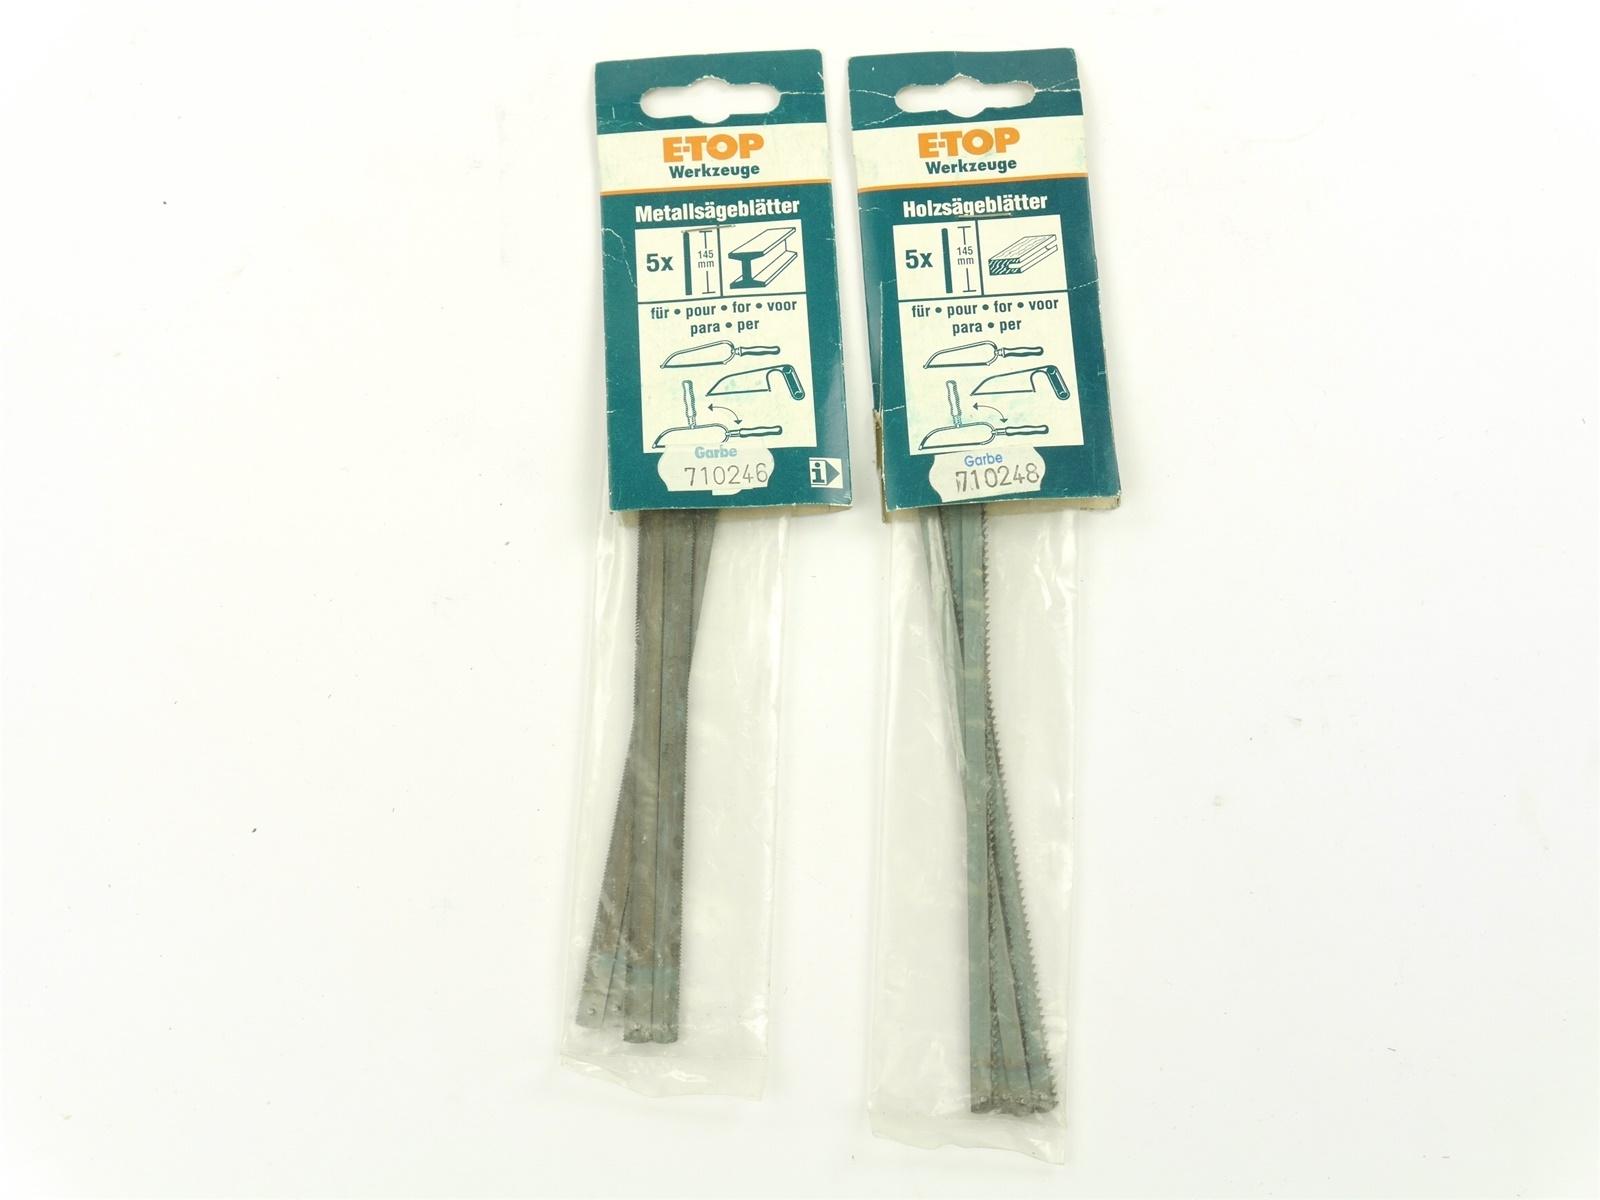 E135 E-Top 2x Werkzeug-Zubehör Metallsägeblätter Holzsägeblätter